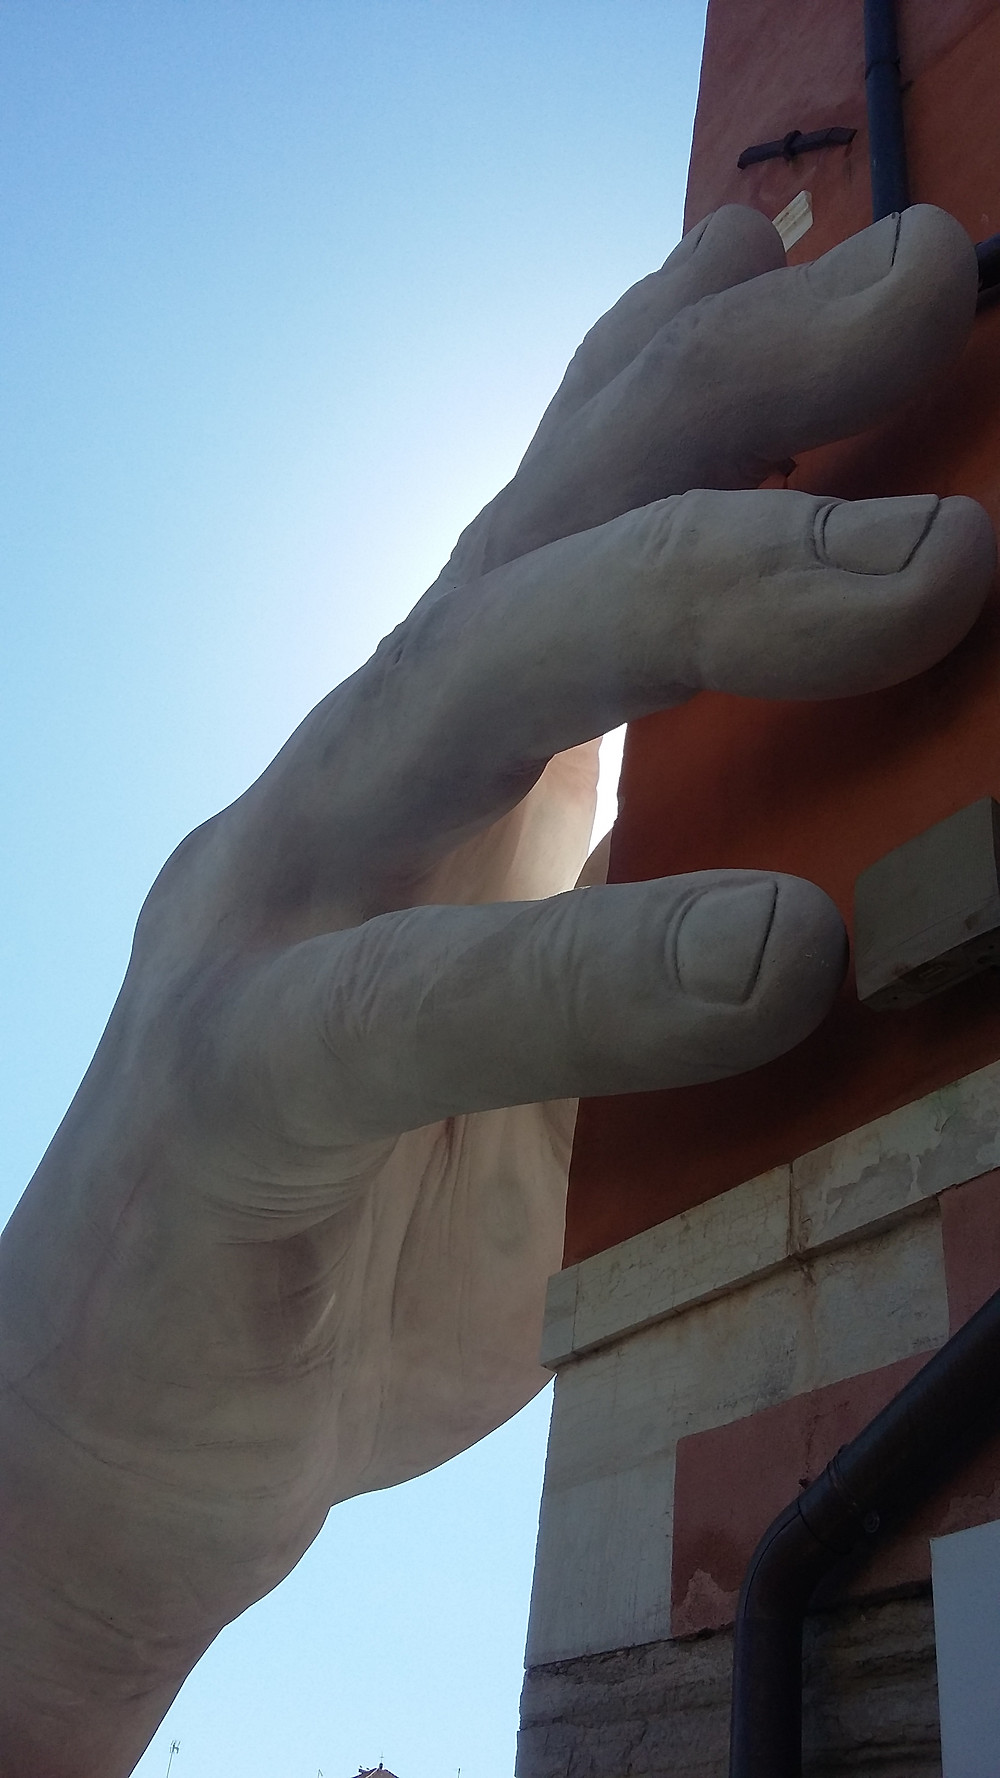 #mani by lorenzo quinn #casagredo